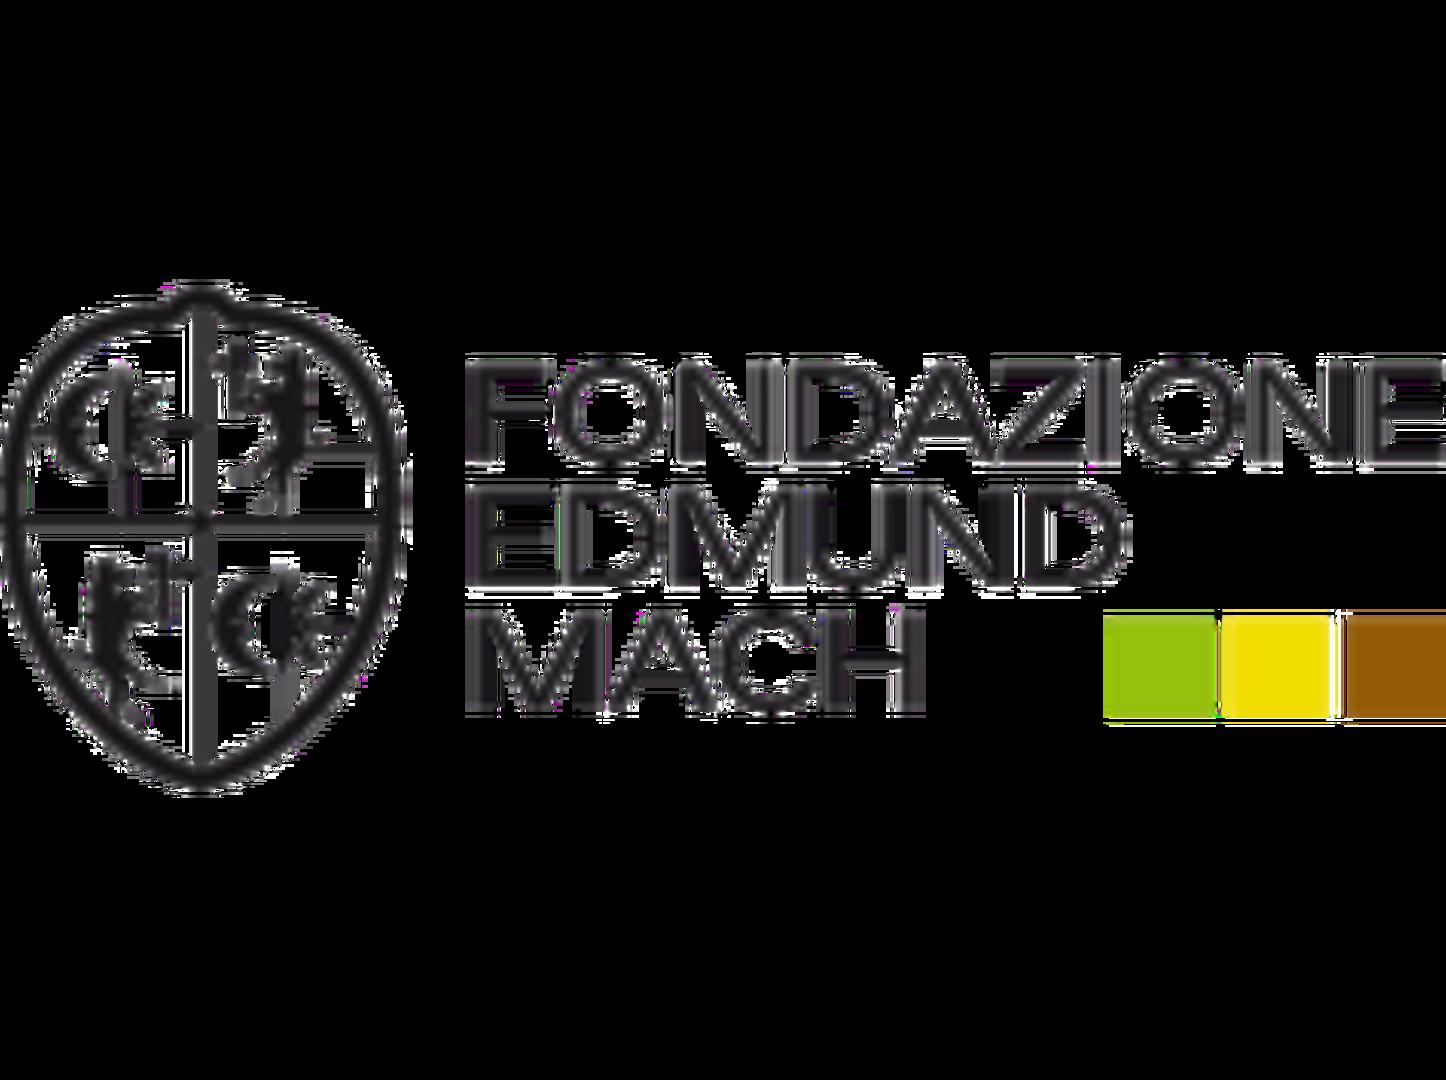 Fondazione Edmund Mach 3x4